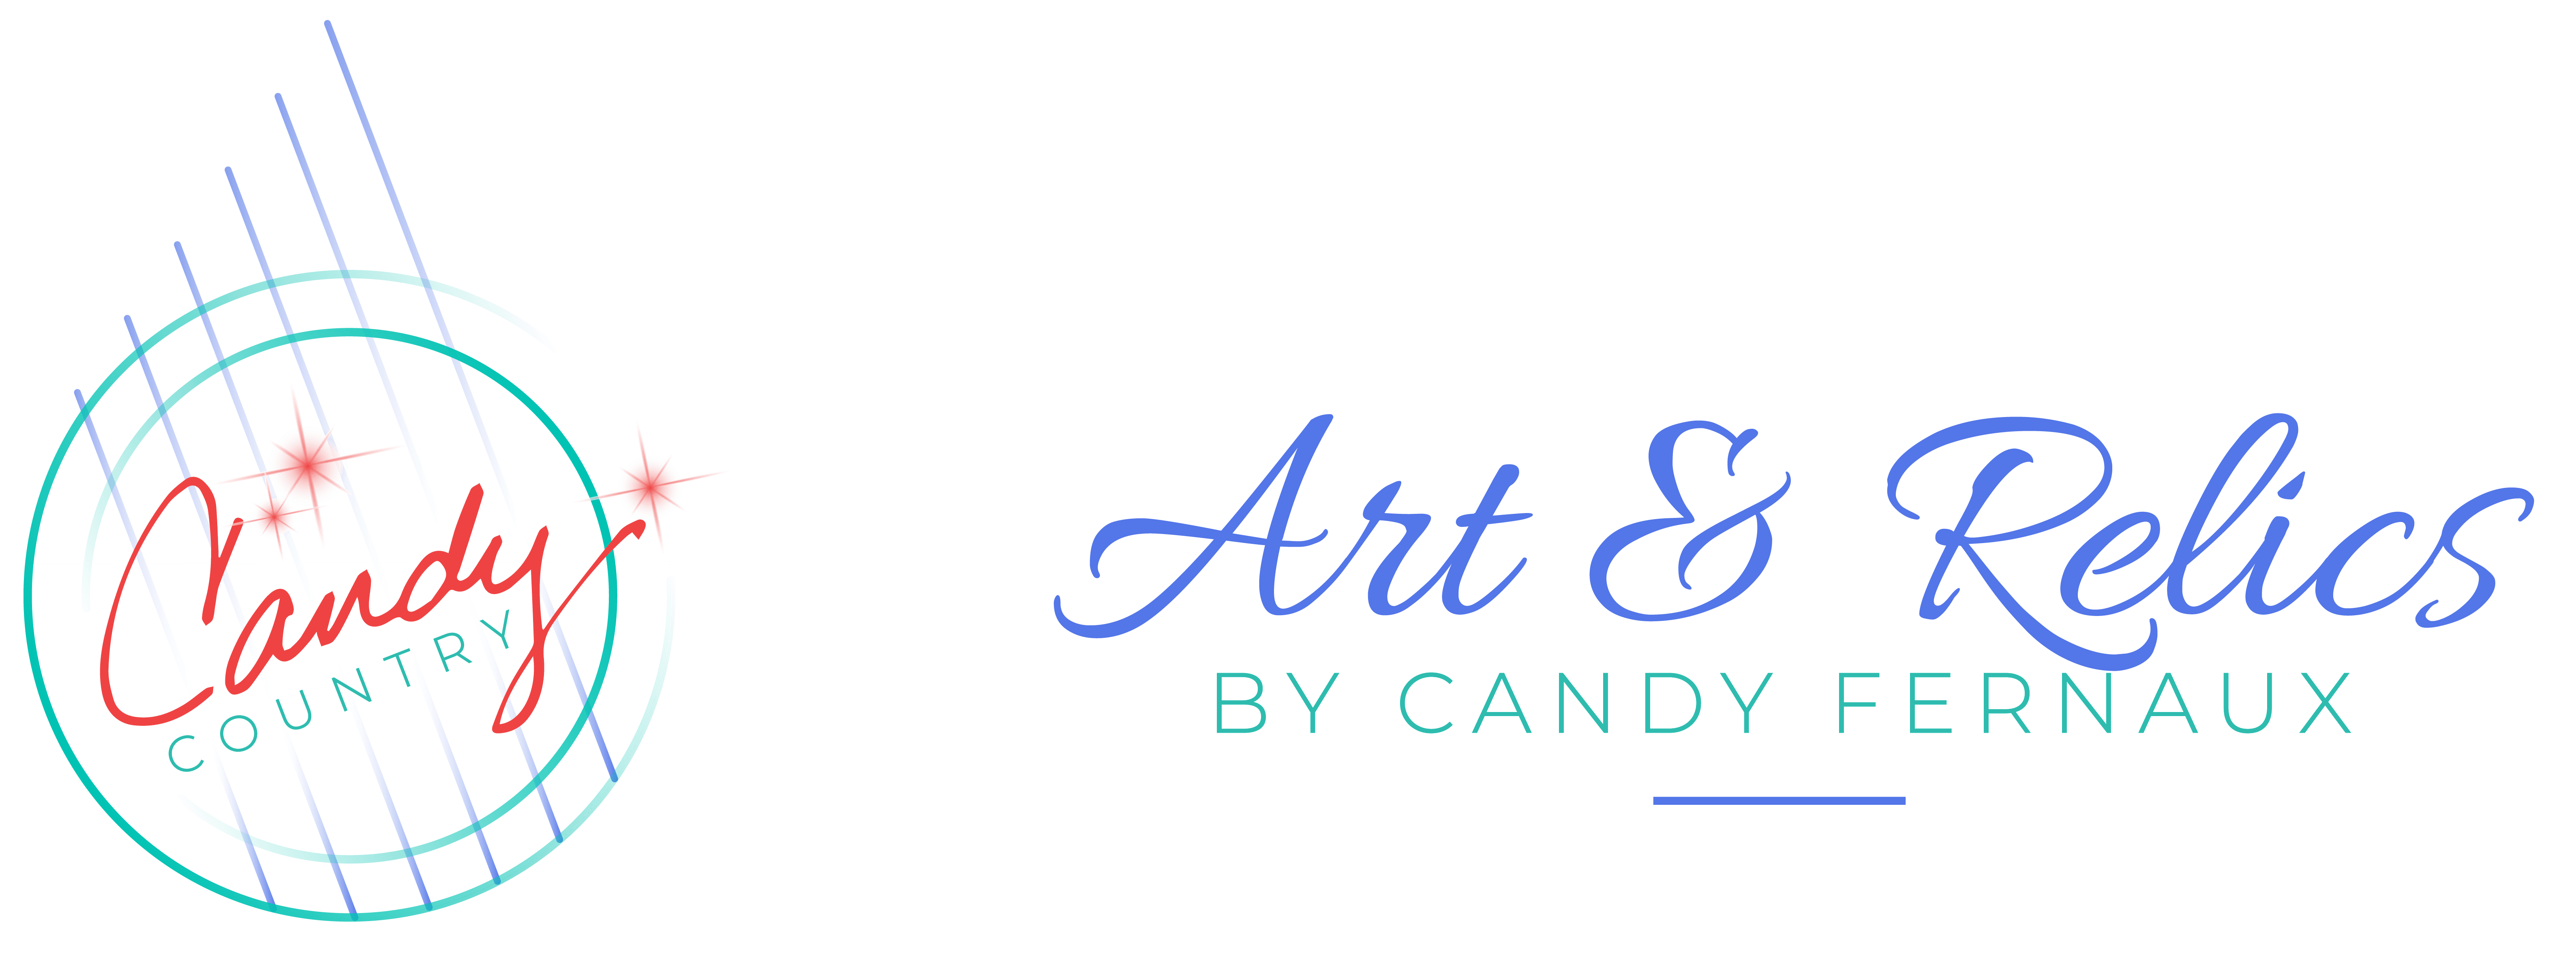 Candy Fernaux Art